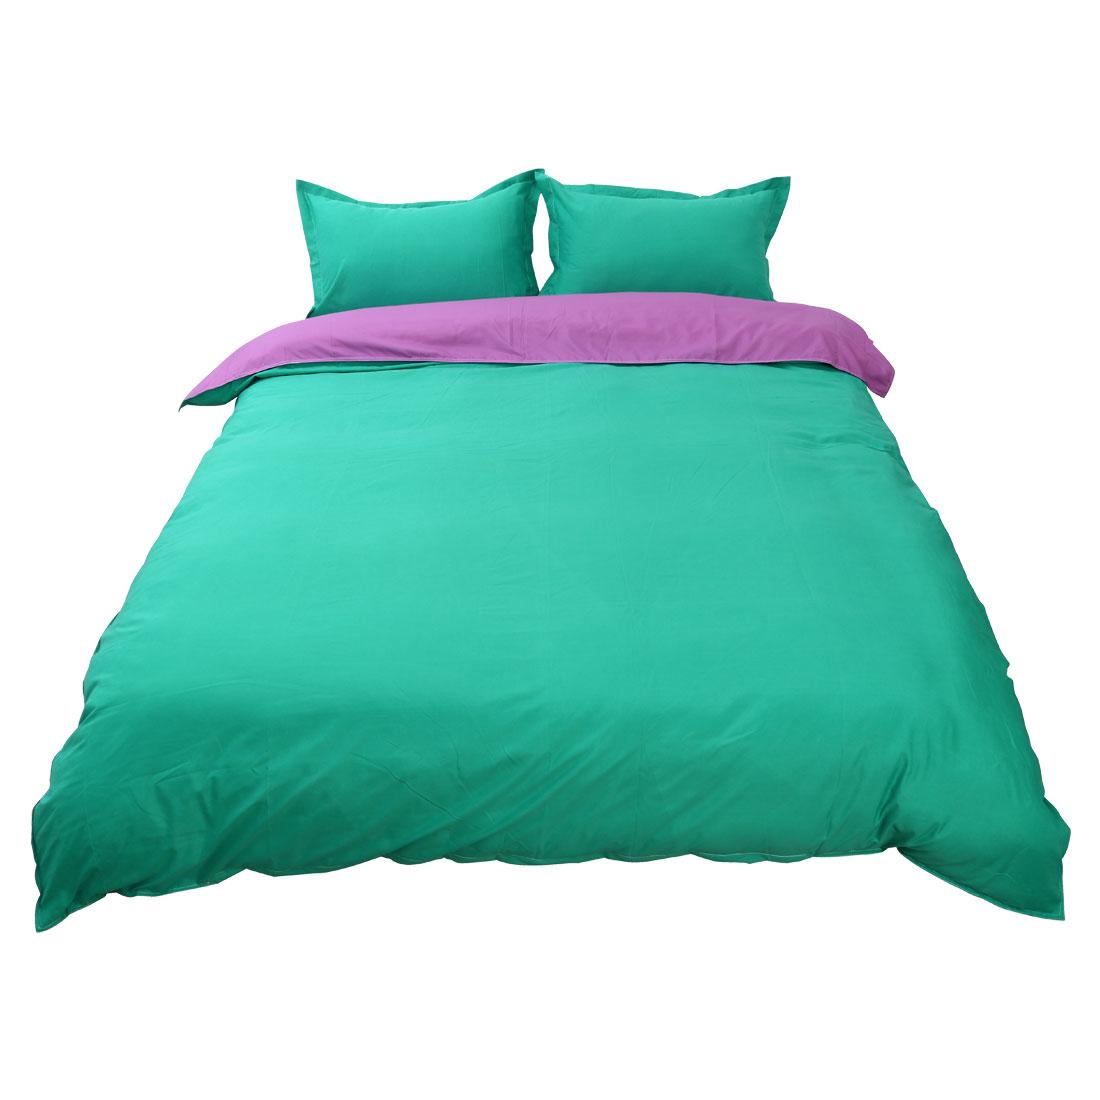 Pure Green Purple Duvet Cover Pillow Case Quilt Cover Bedding Set Super King